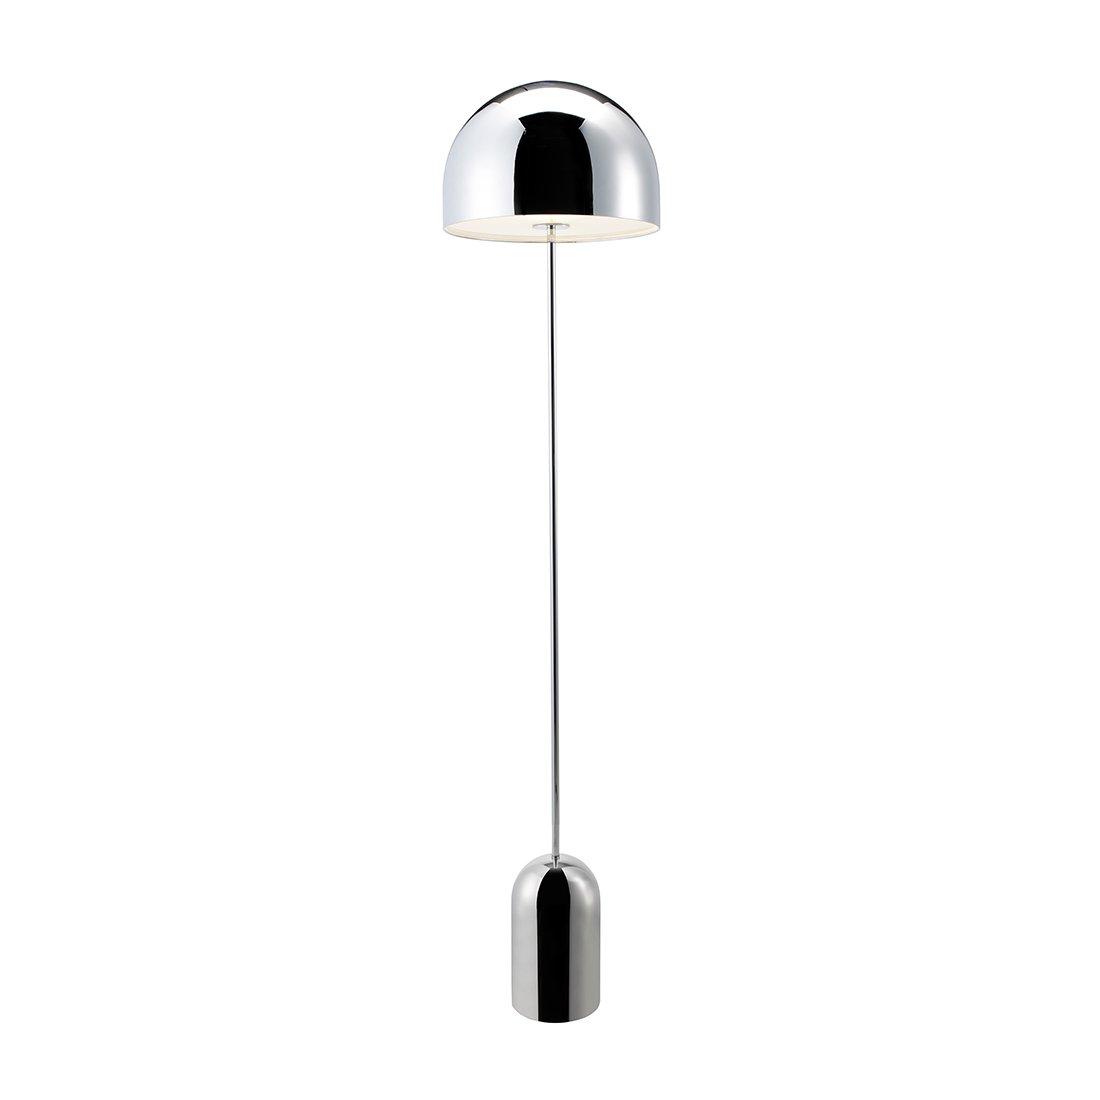 Bell Vloerlamp - Tom Dixon